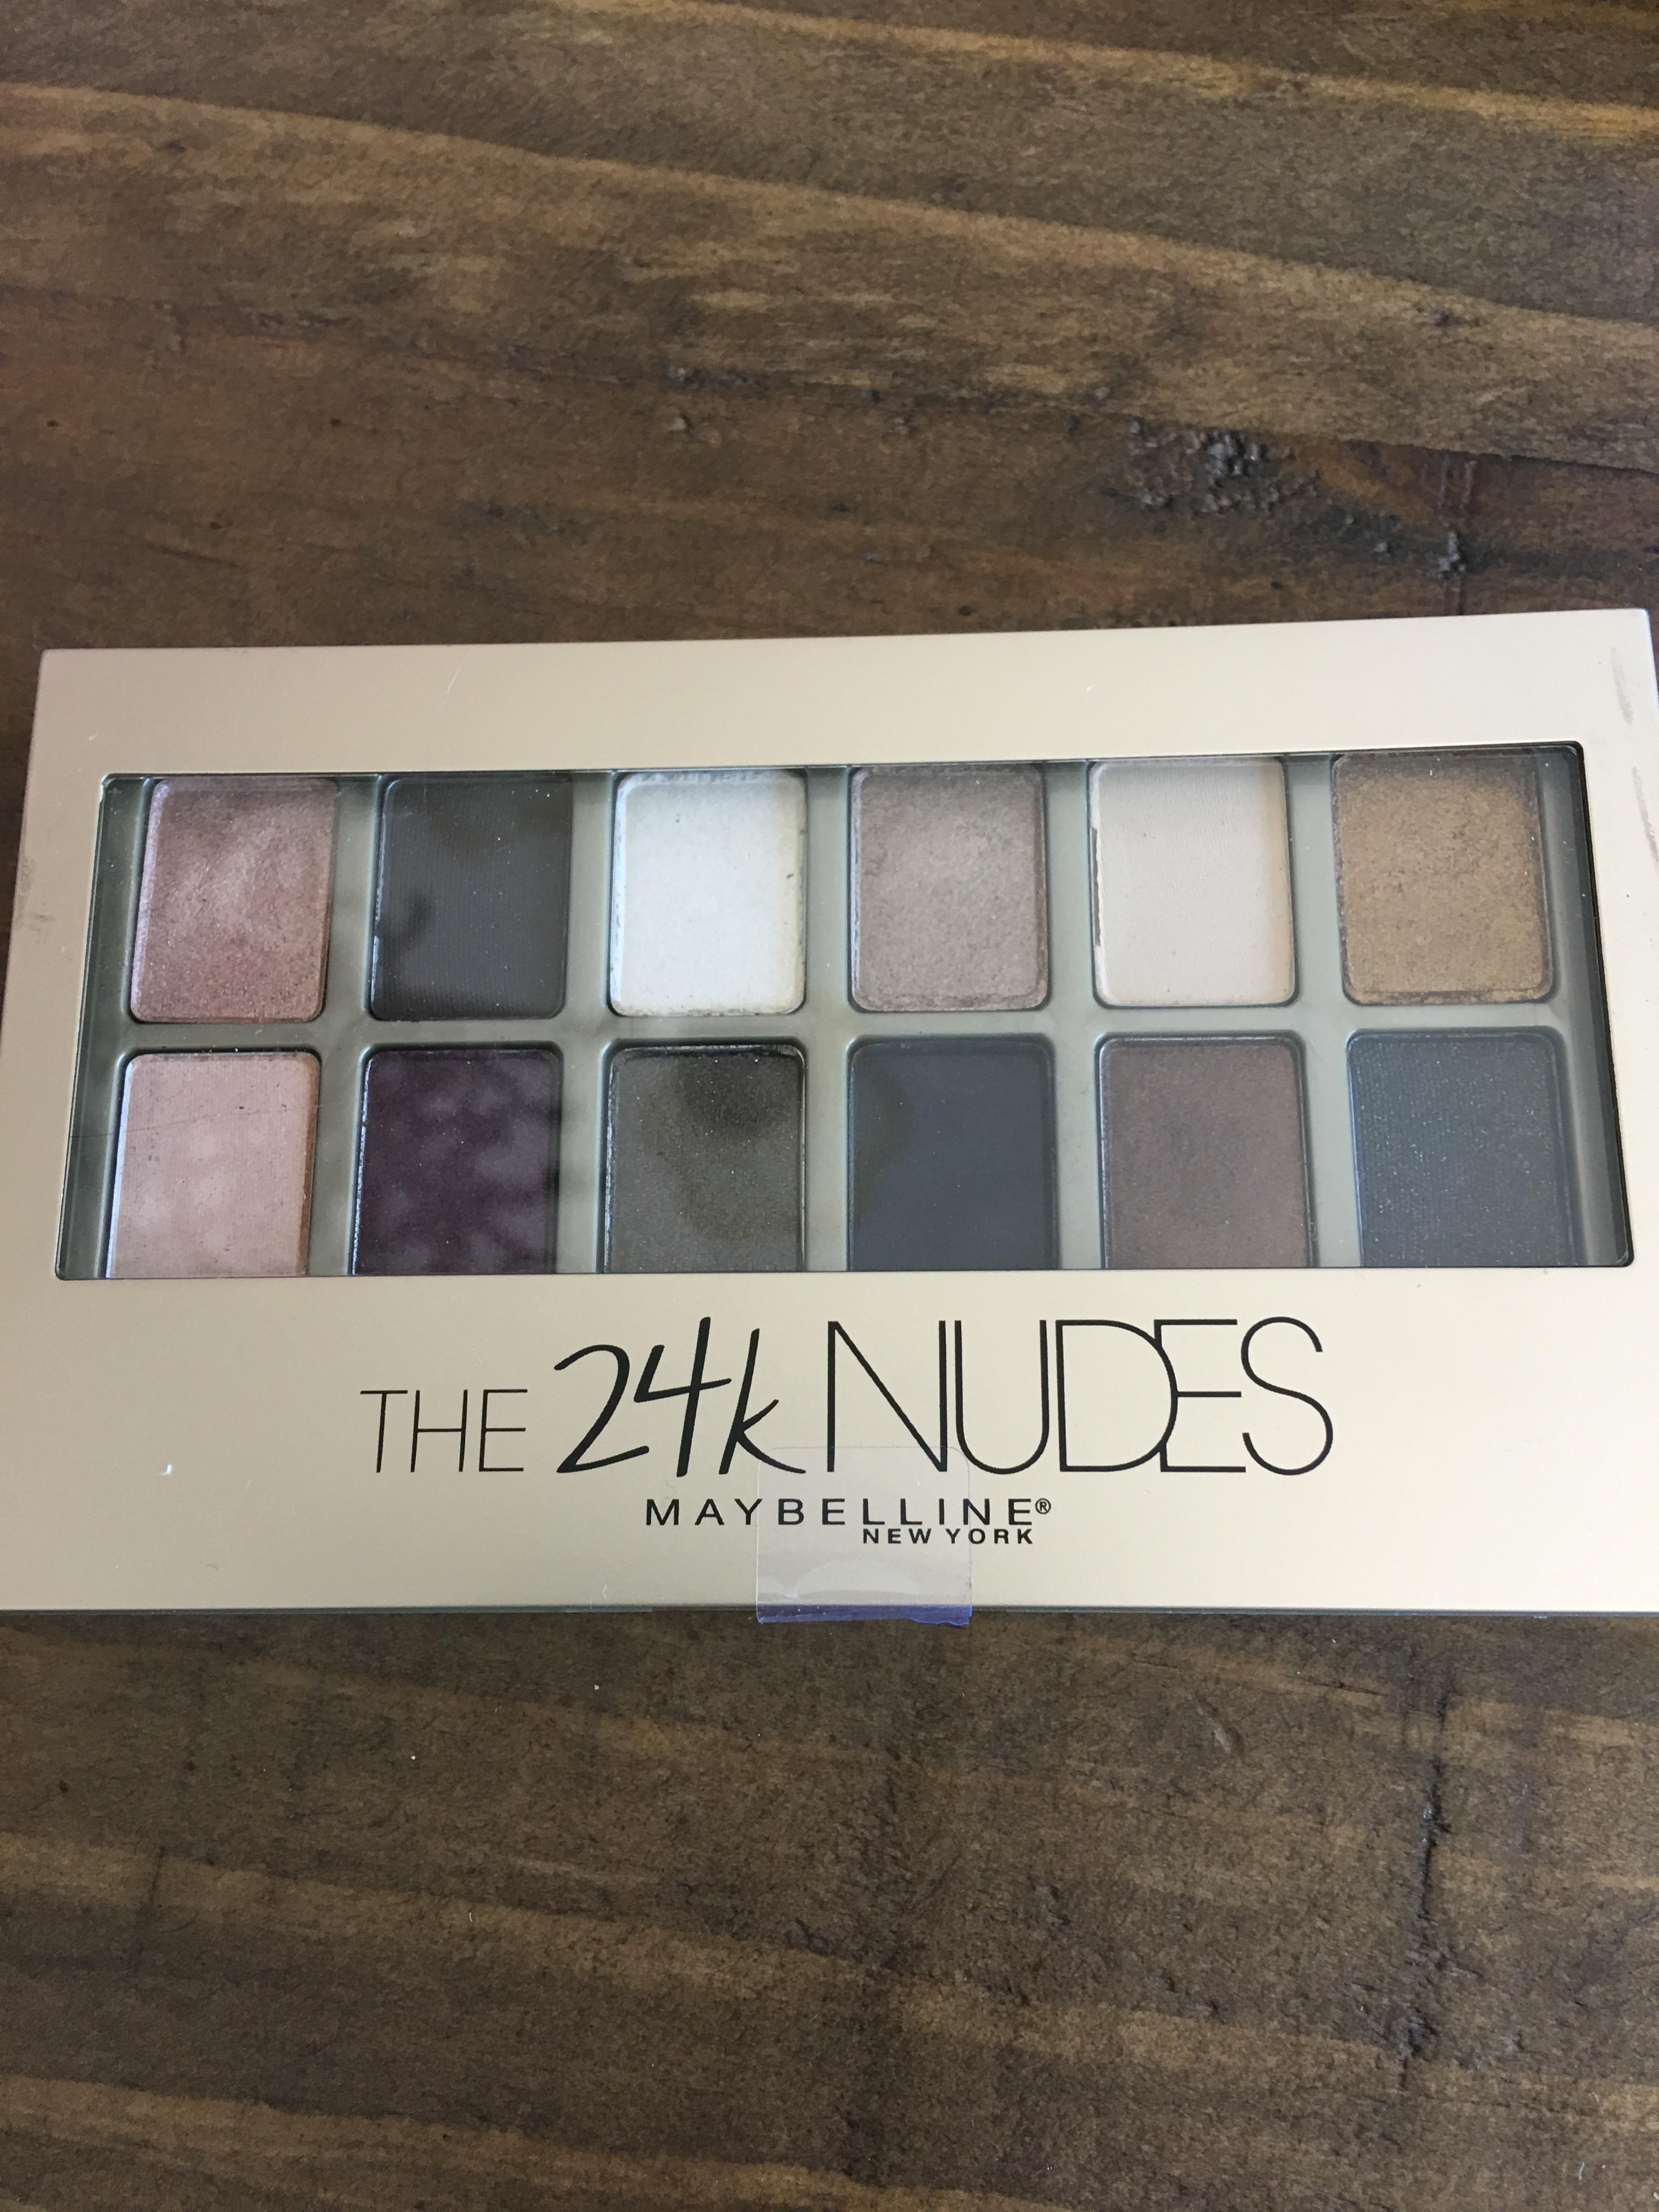 Maybelline New York The 24k Nudes Eyeshadow Palette